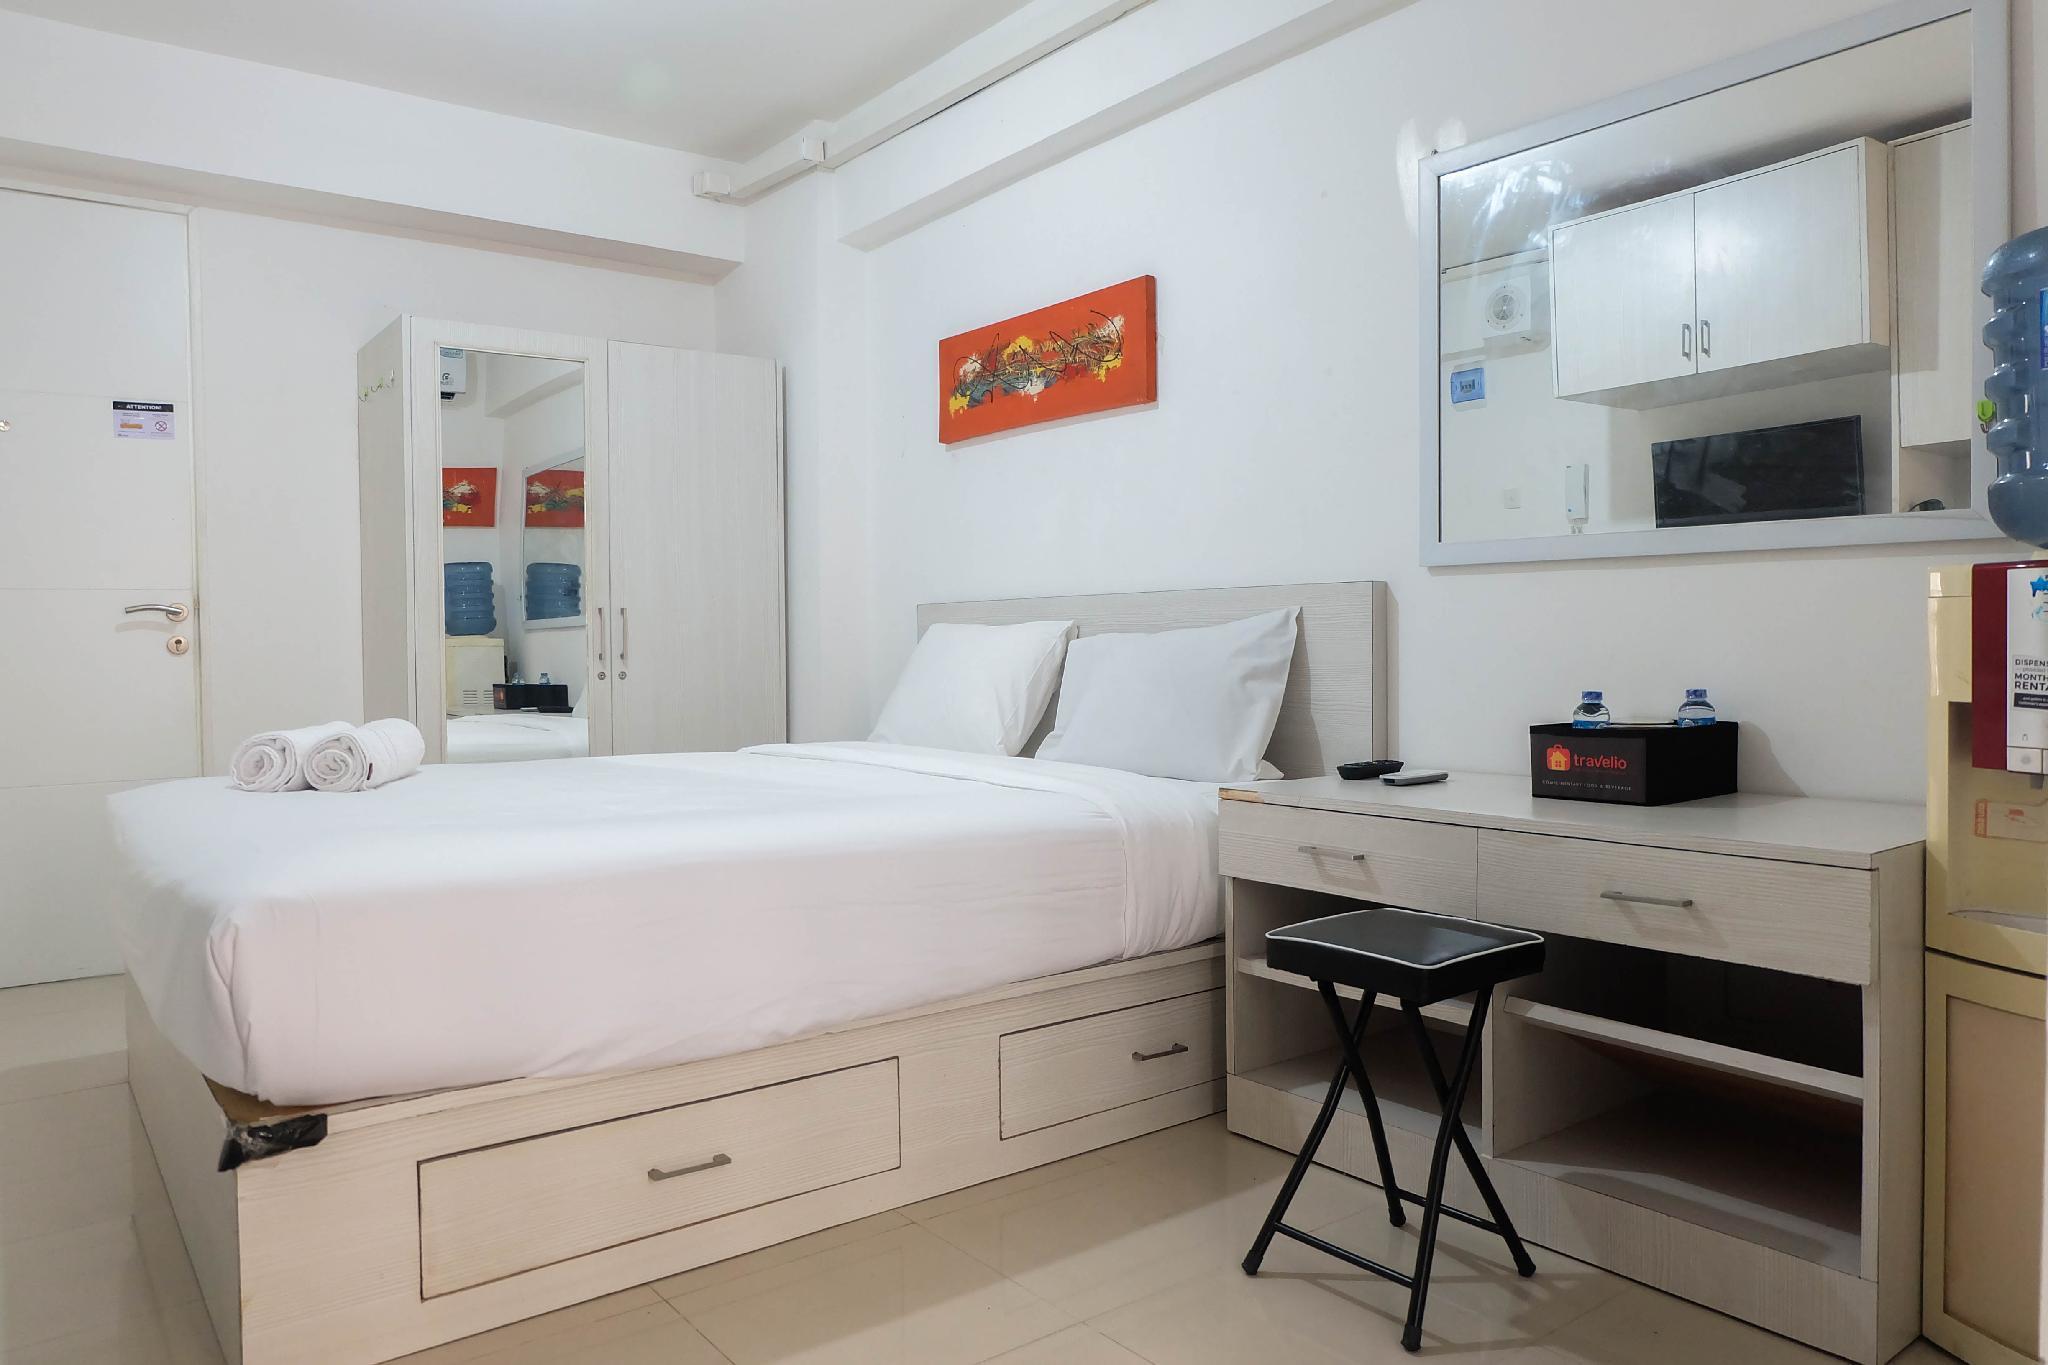 Tidy Studio Apartment At Bassura City By Travelio